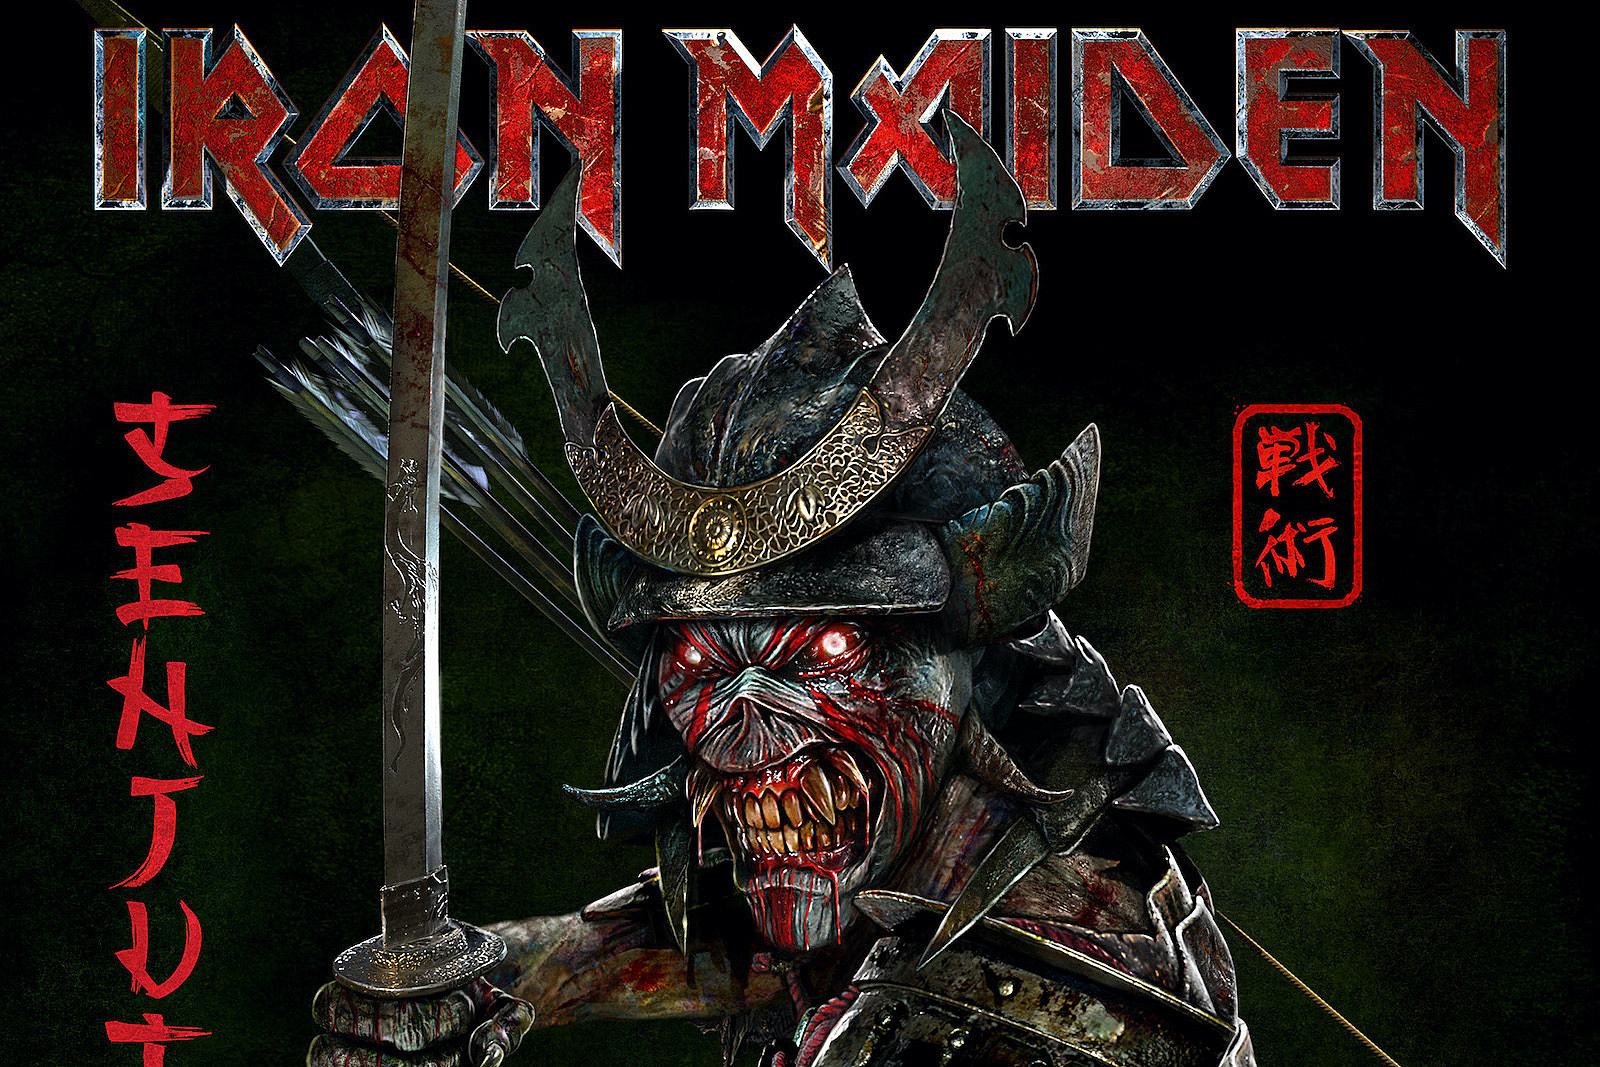 Iron Maiden Announce New Album, 'Senjutsu'